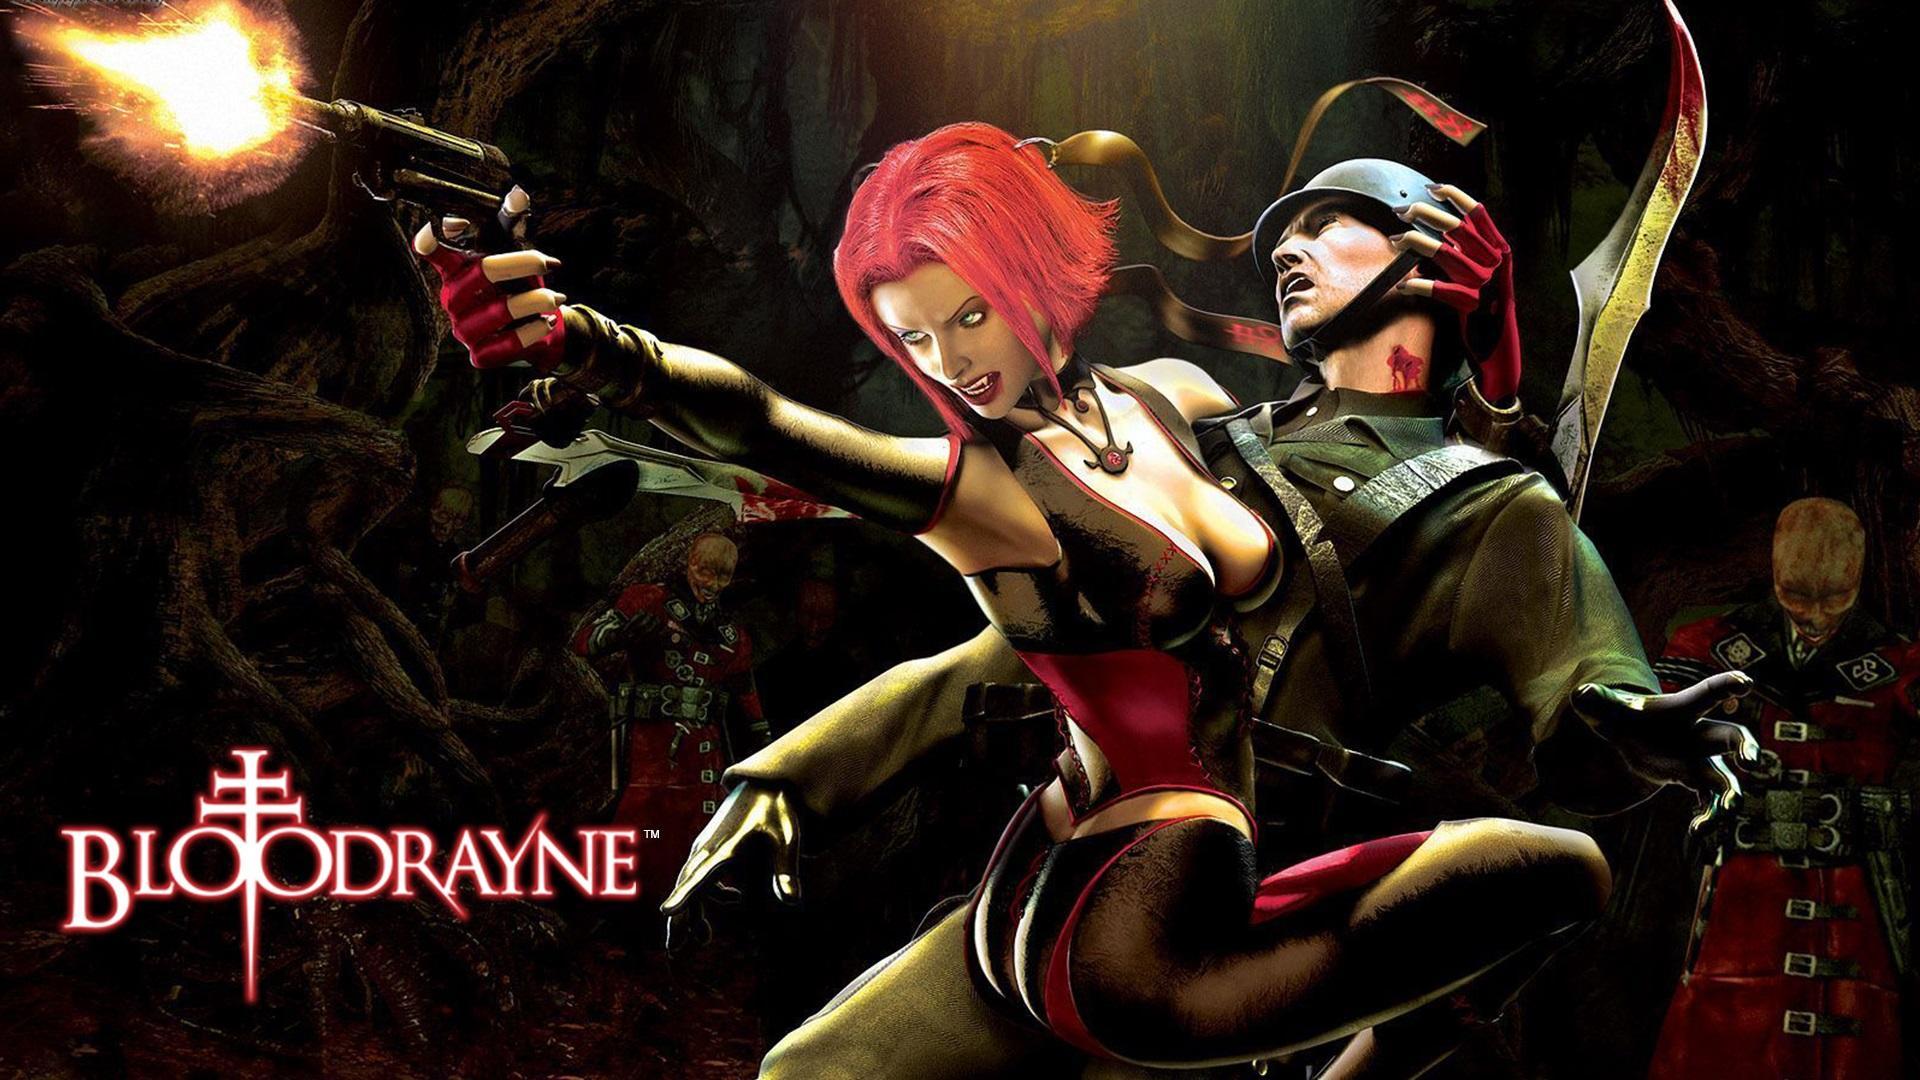 bloodrayne betrayal xbox 360